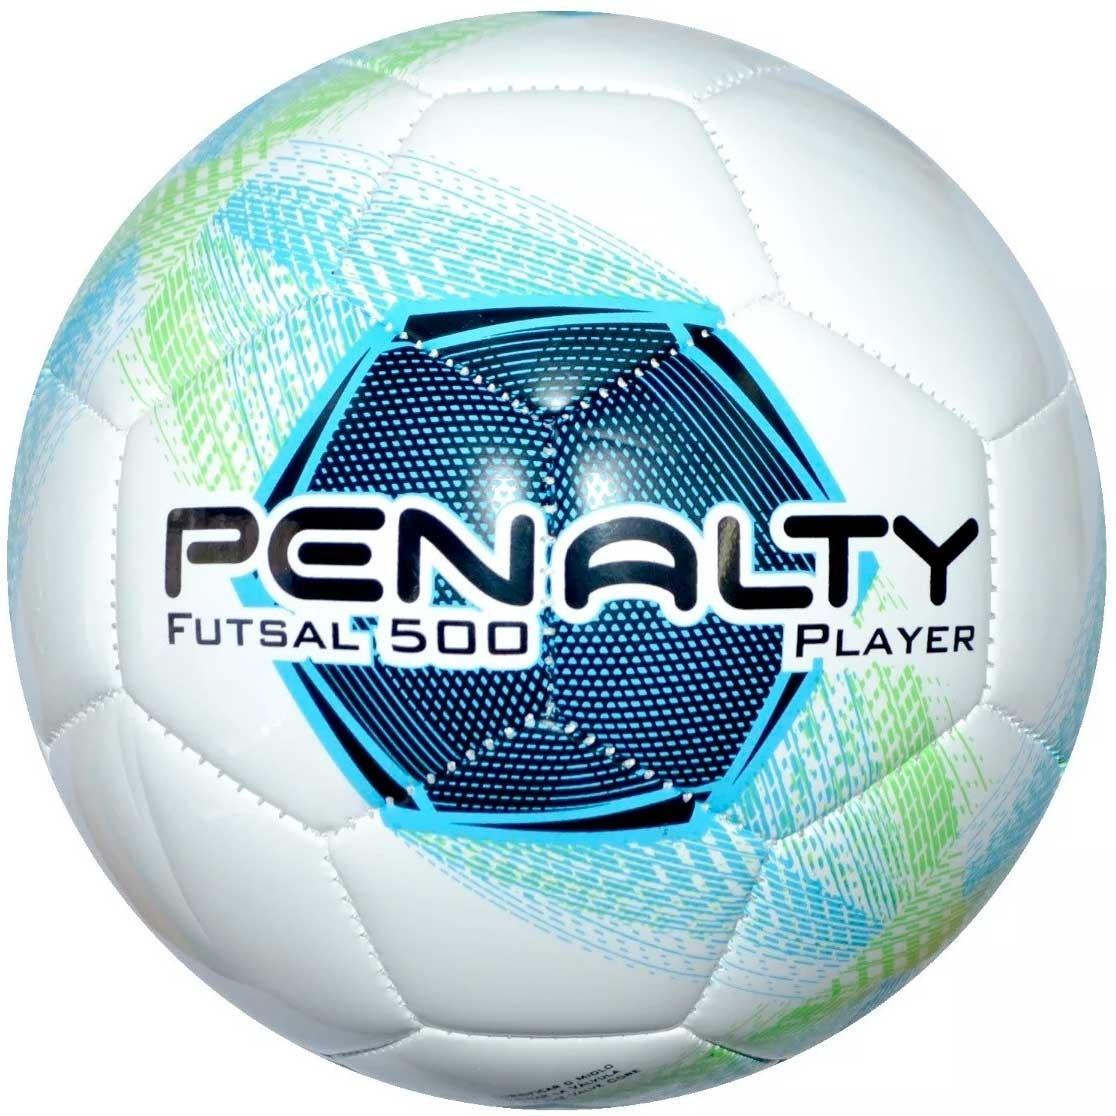 355edab990281 pelota de futbol nº 4 penalty futsal 500 player papi. Cargando zoom.